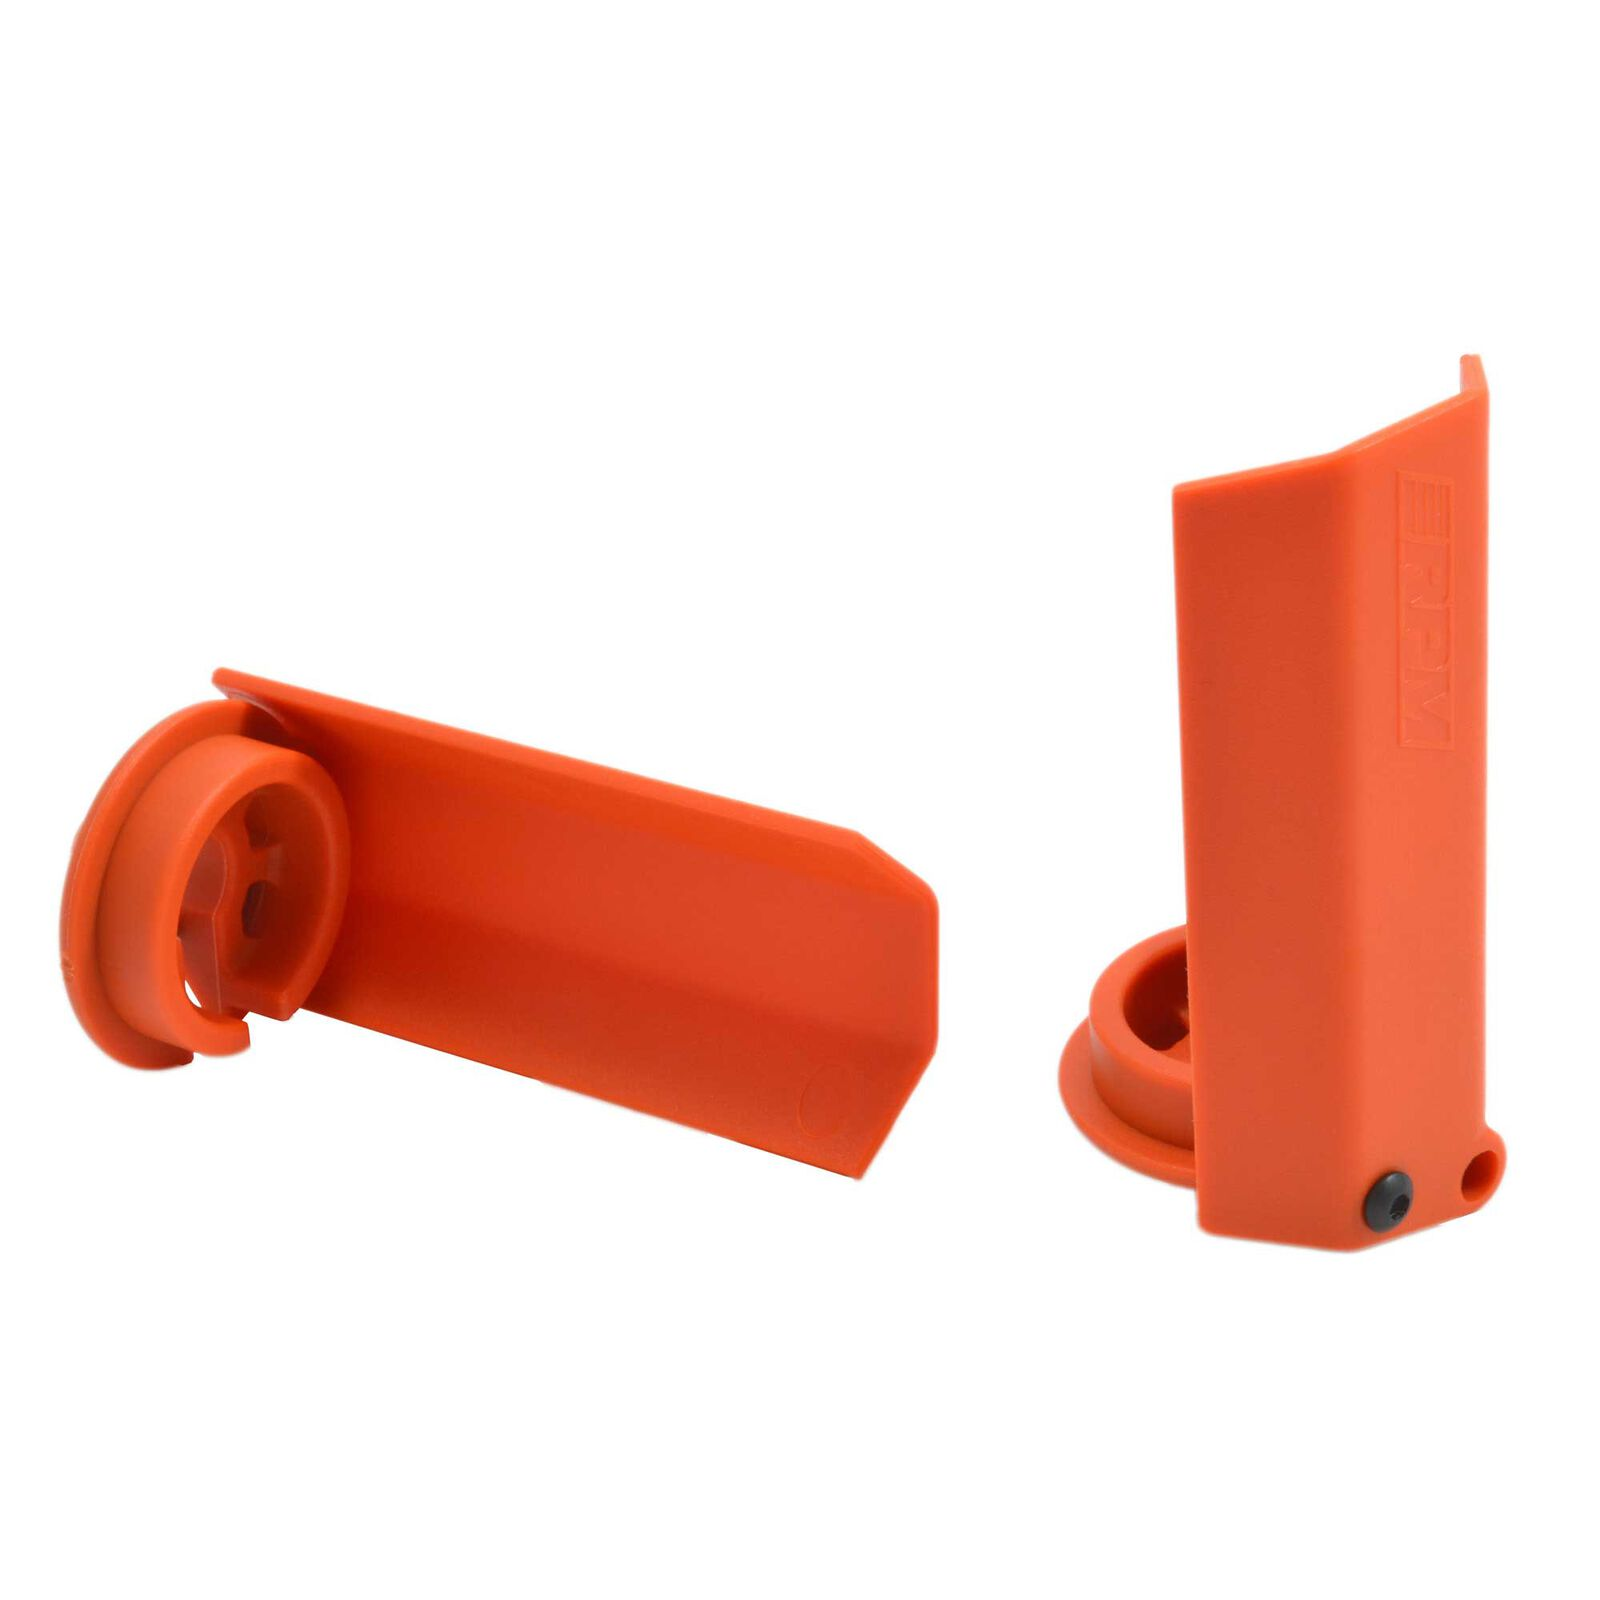 Shock Shaft Guards, Orange: Traxxas X-Maxx